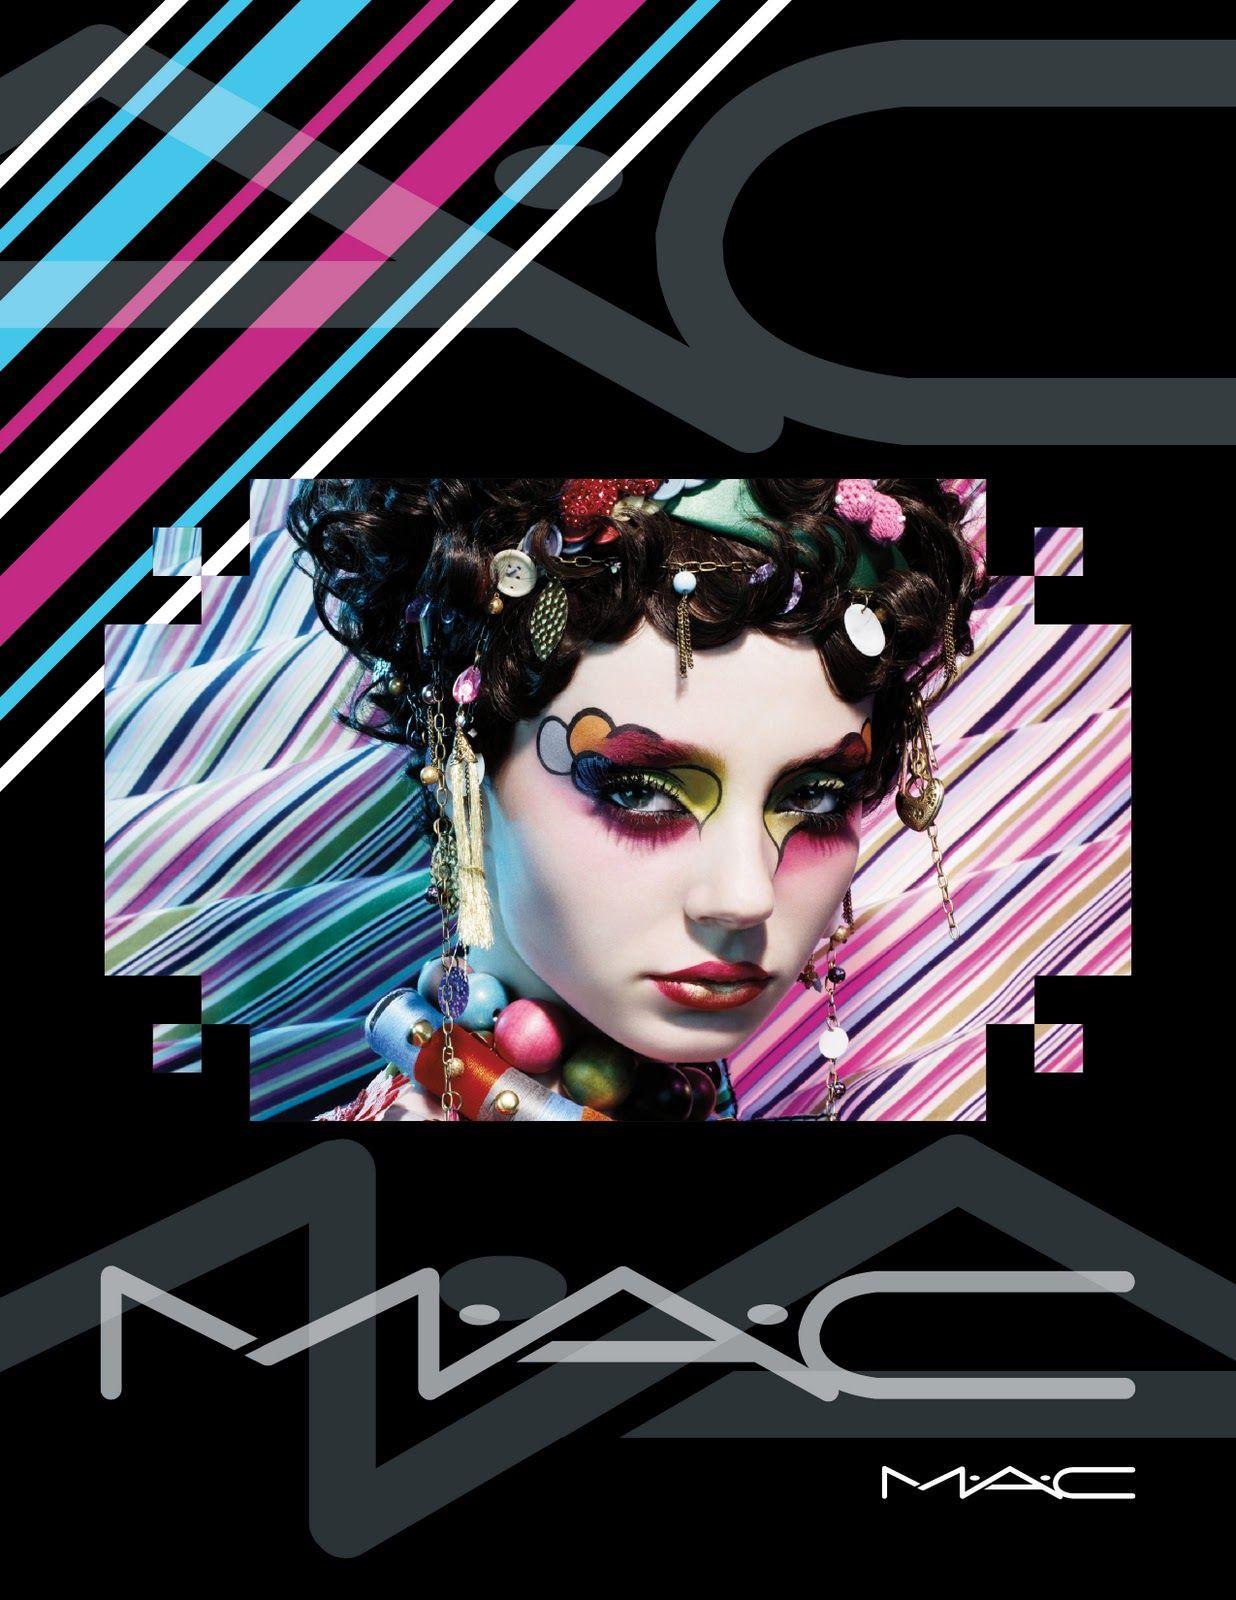 Poster design on mac - Mac Cosmetic Eyeshadow Ad